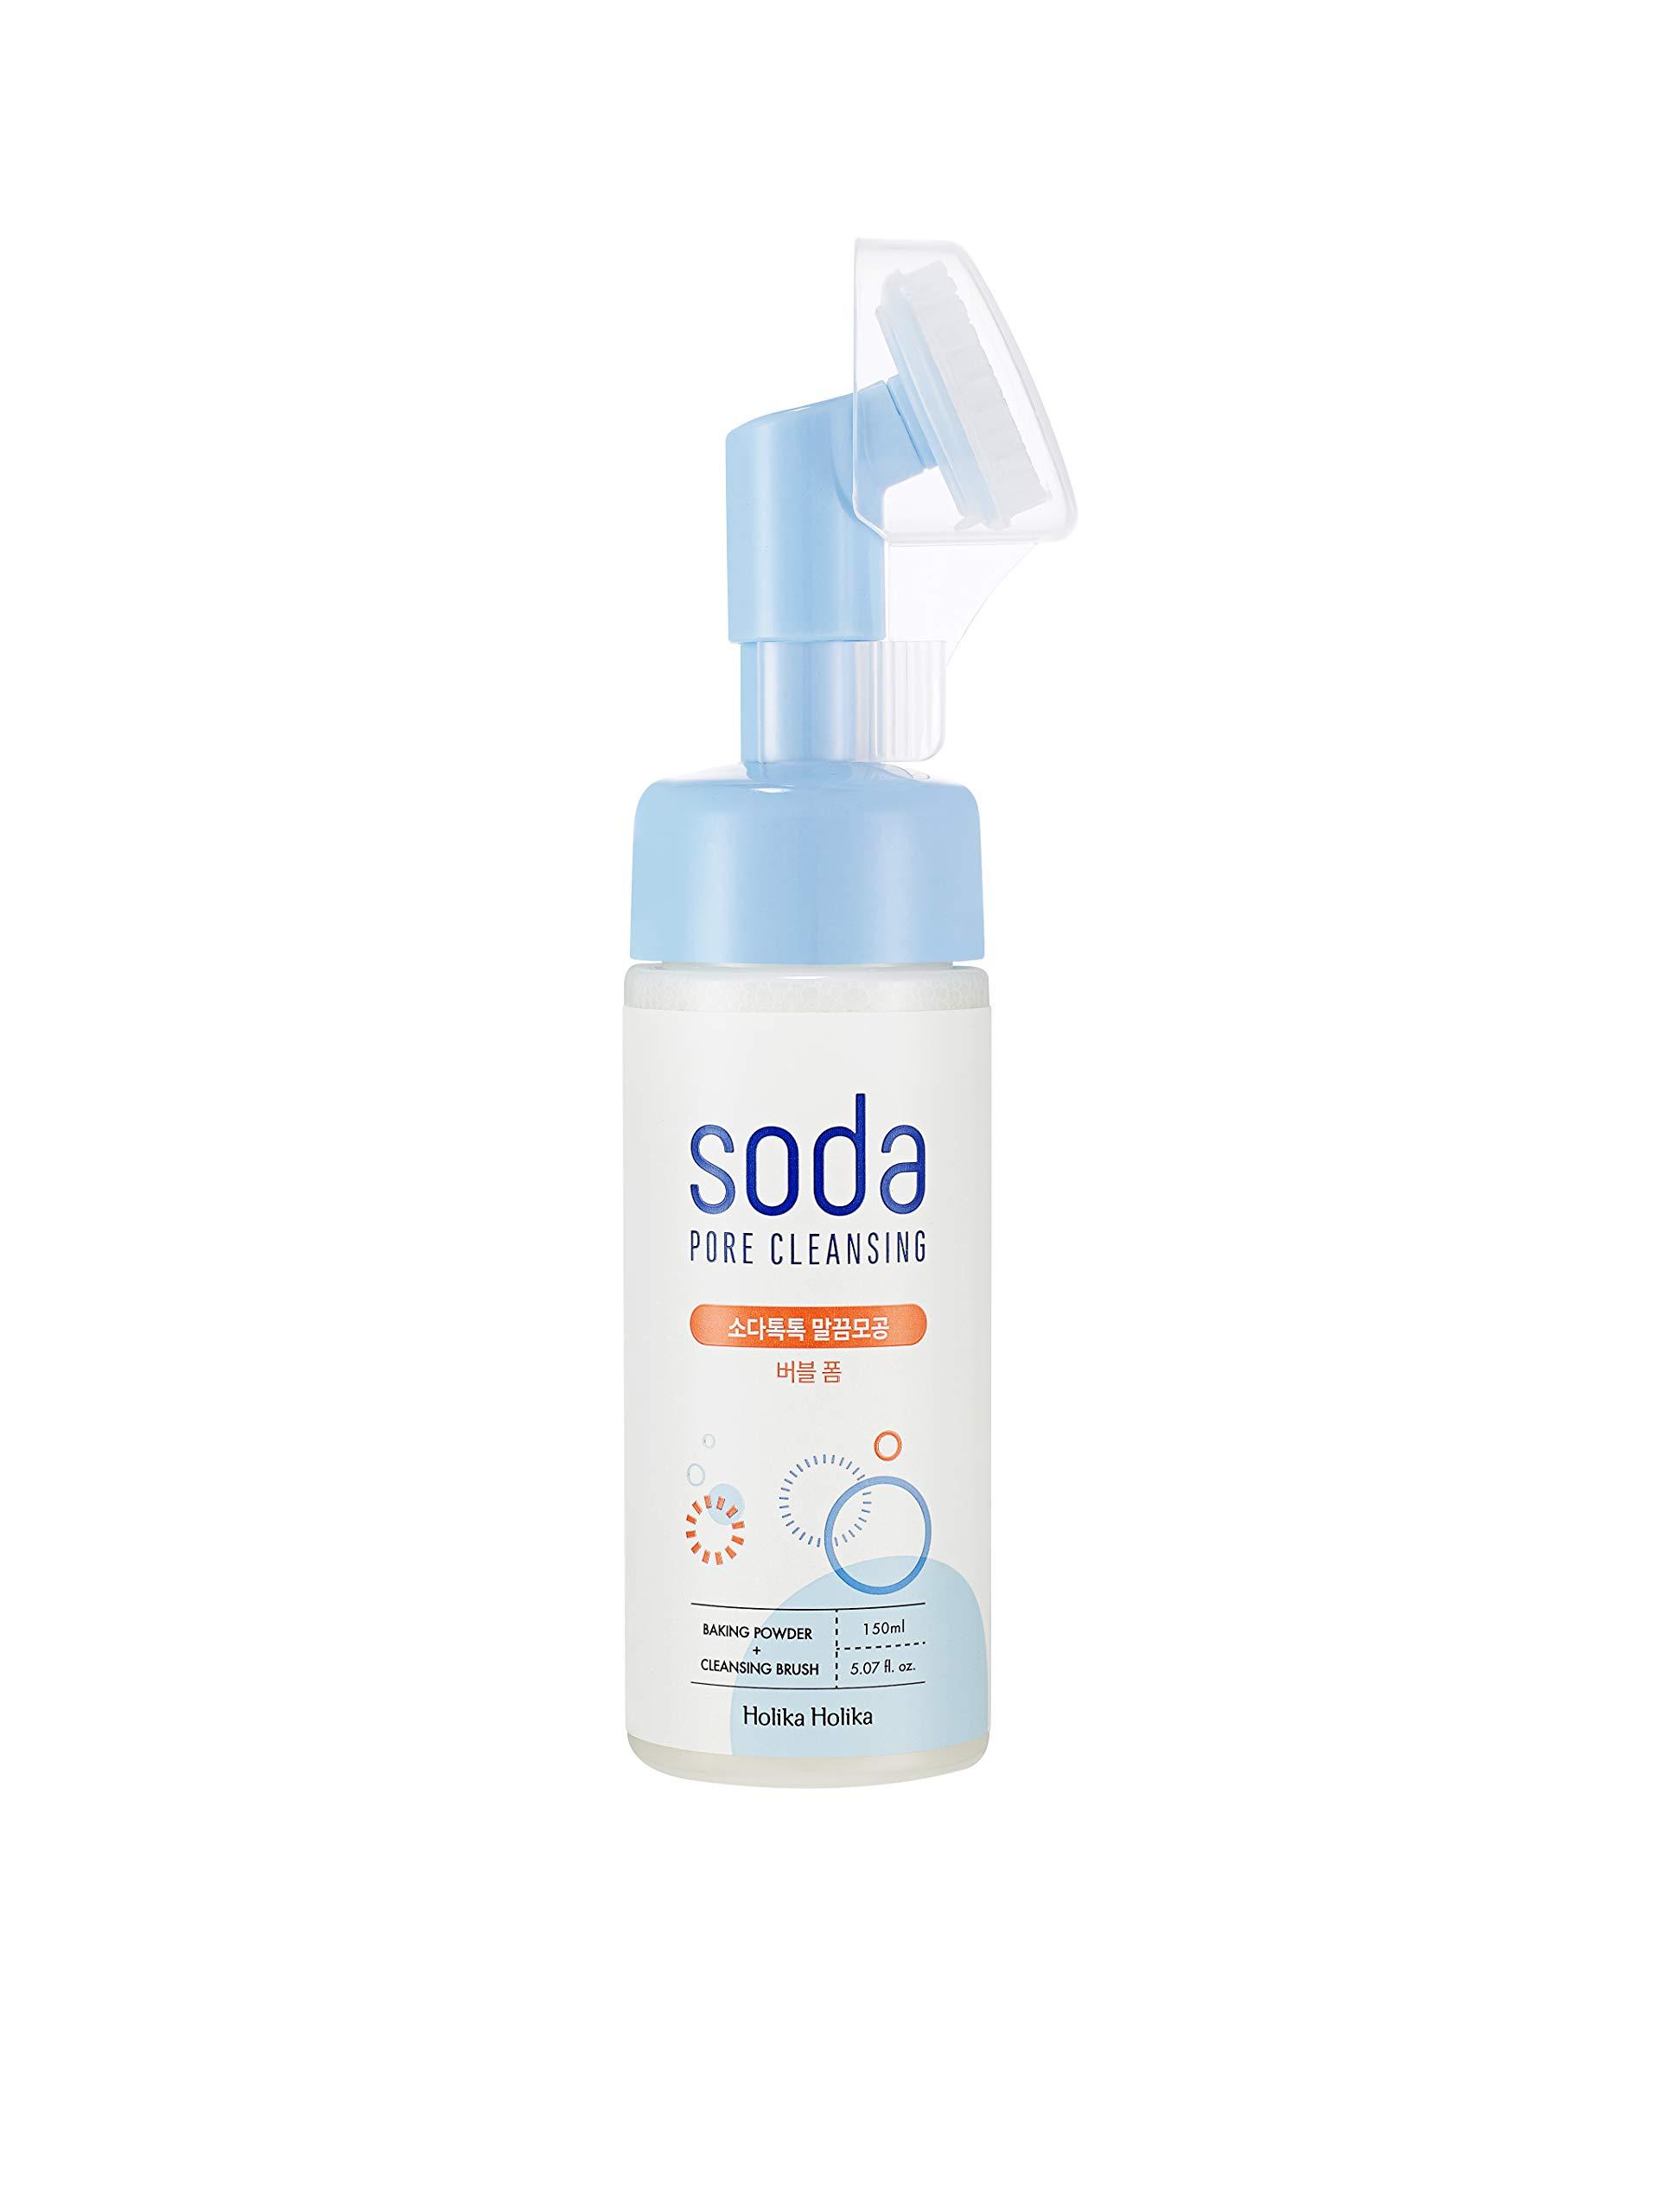 [Holika Holika] Soda Pore Cleansing Bubble Foam 5.07 fl.oz. …